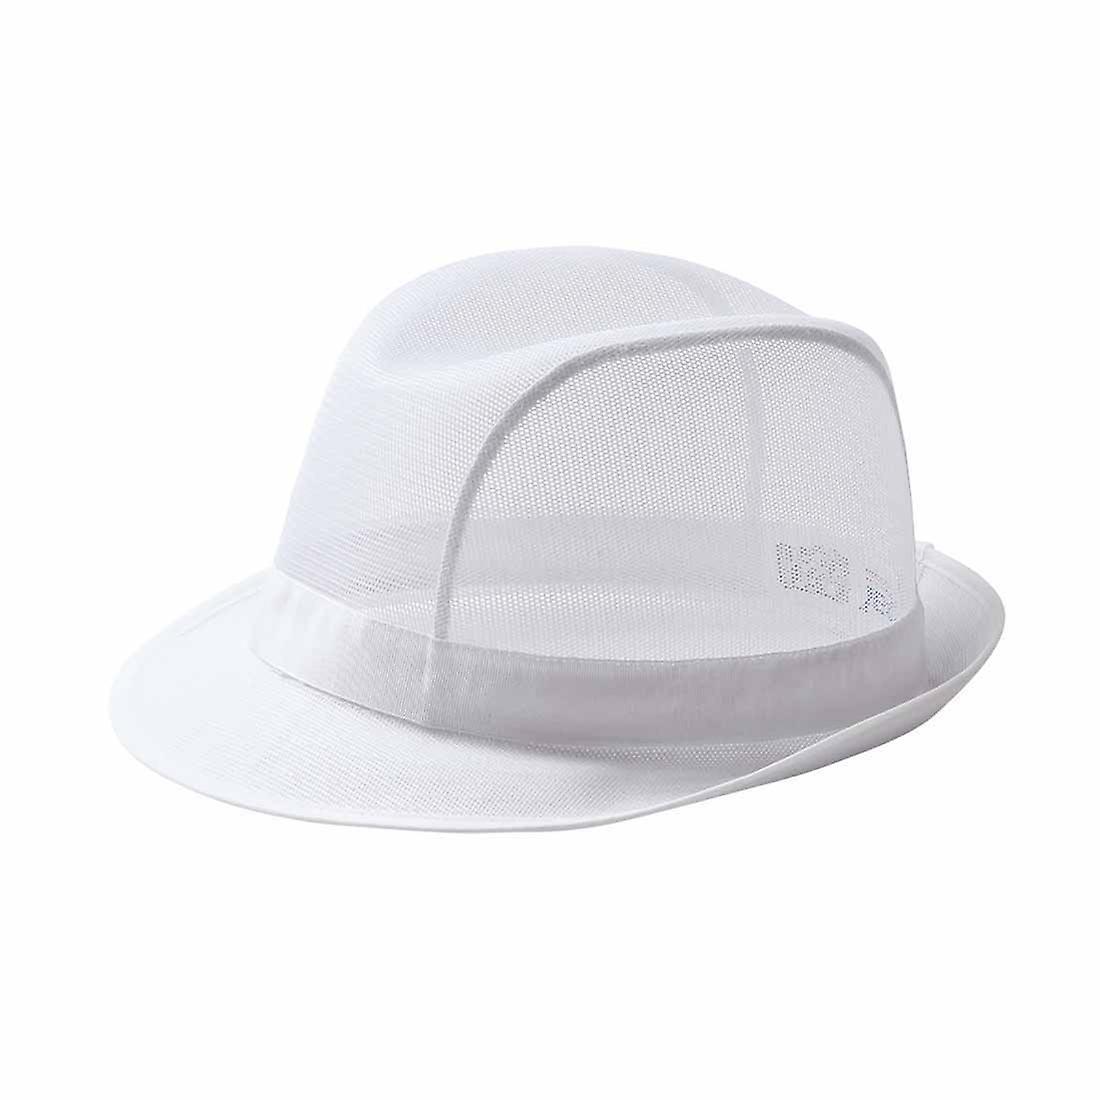 Portwest - Catering & Food Handling Trilby Hat